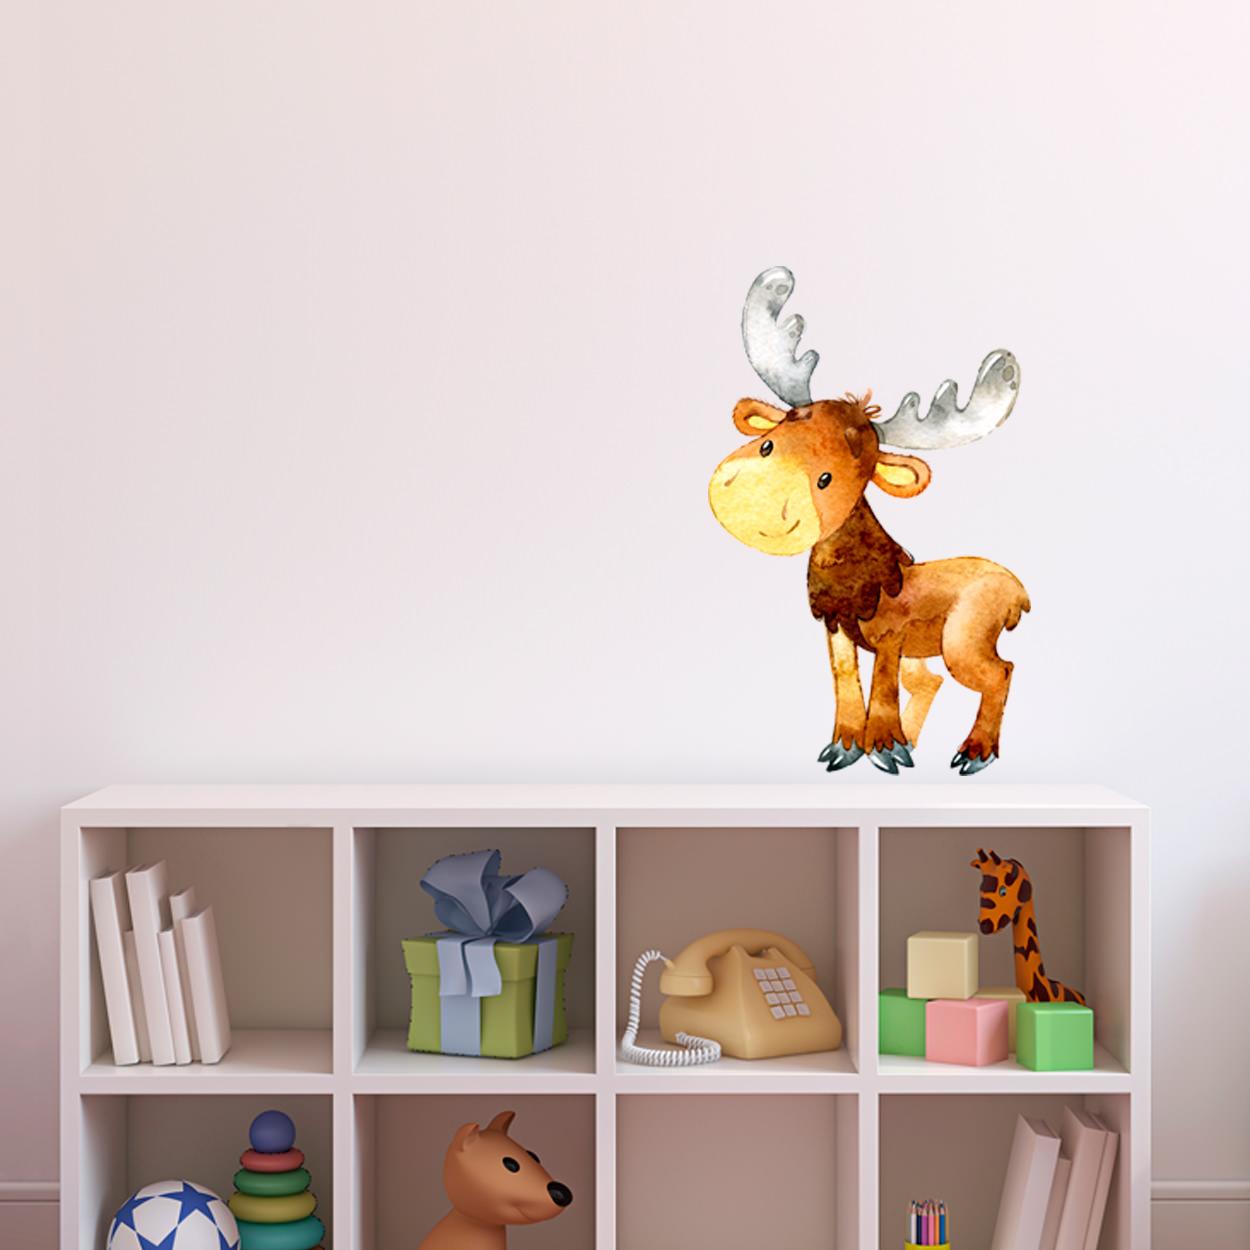 Wandtattoo Aufkleber Wandsticker Elch Hirsch Deer Kinderzimmer Dekoration